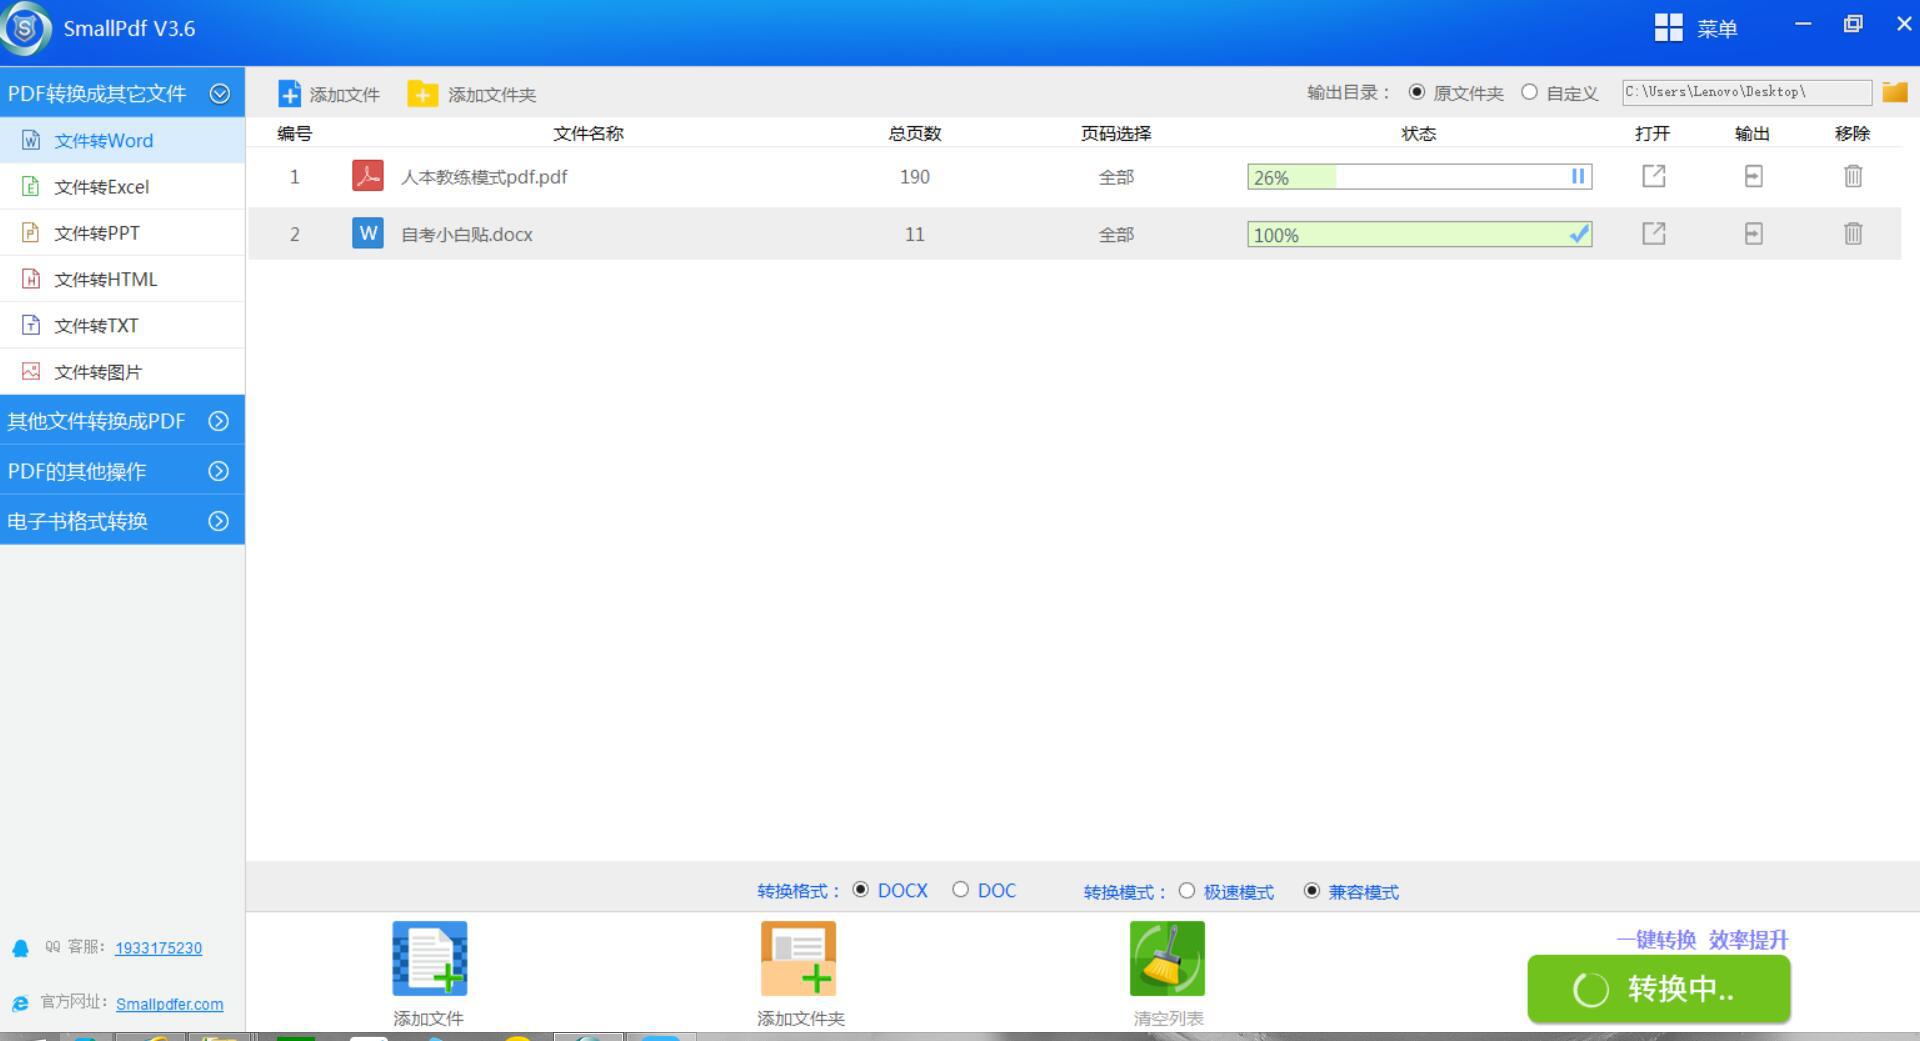 Small pdf转换器V3.6 官方版